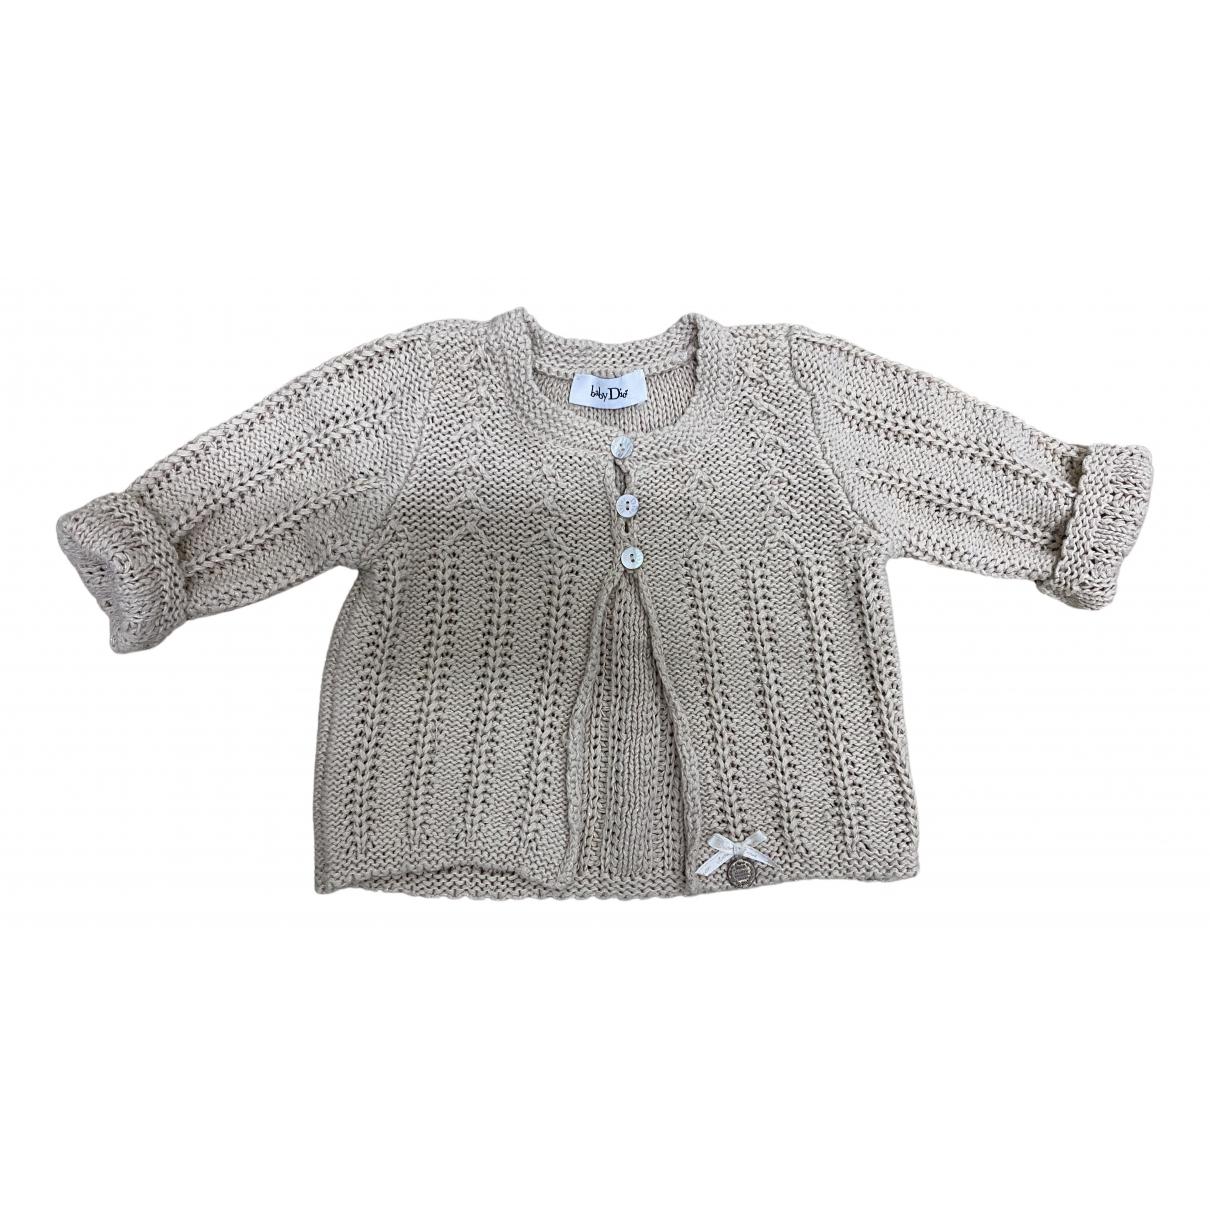 Dior N Beige Wool Knitwear for Kids 3 months - up to 60cm FR